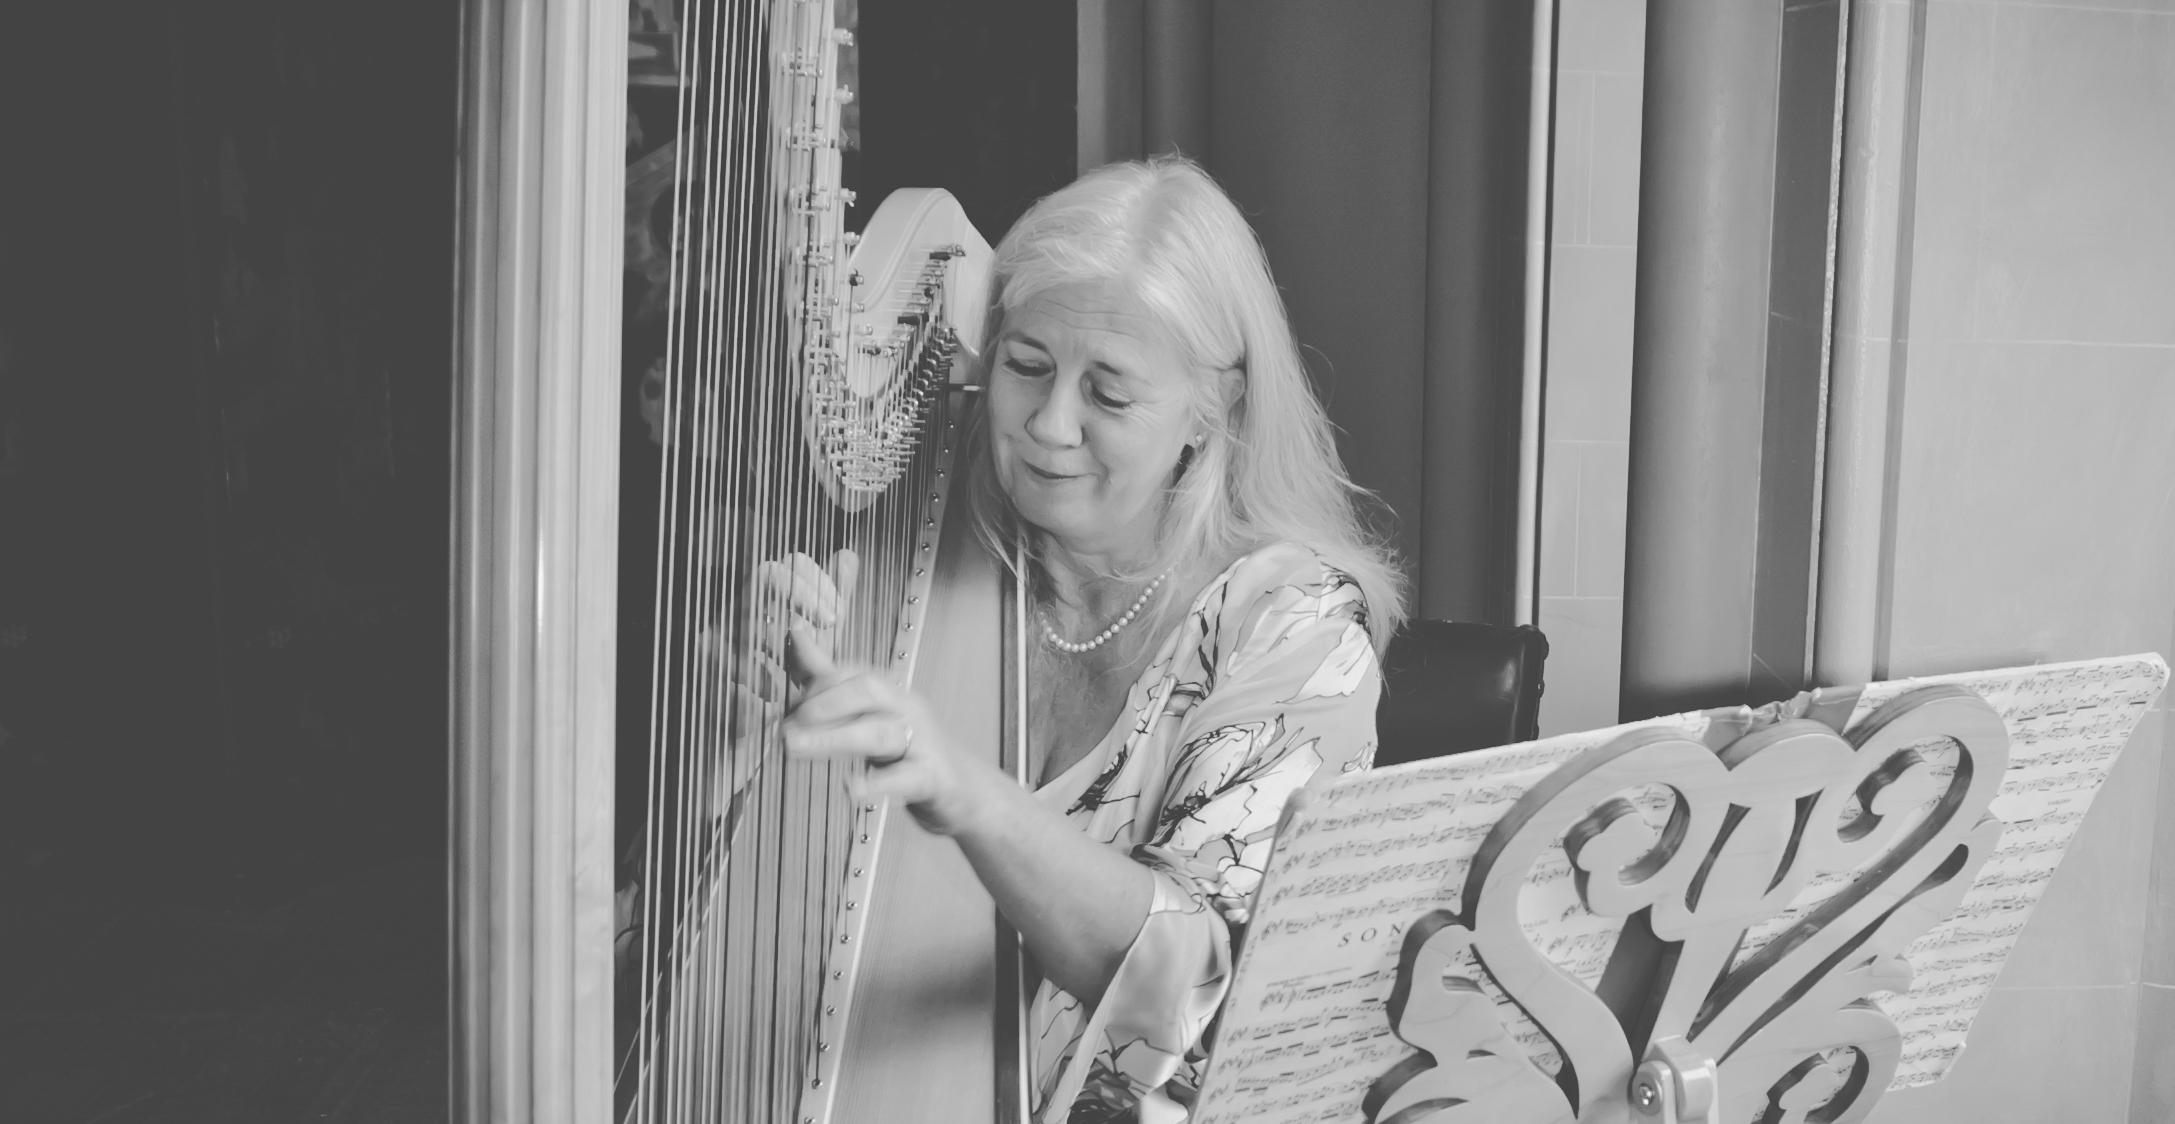 004  - Xenia Horne UK Harpist by Mark Pugh www.markpugh.com -5.JPG